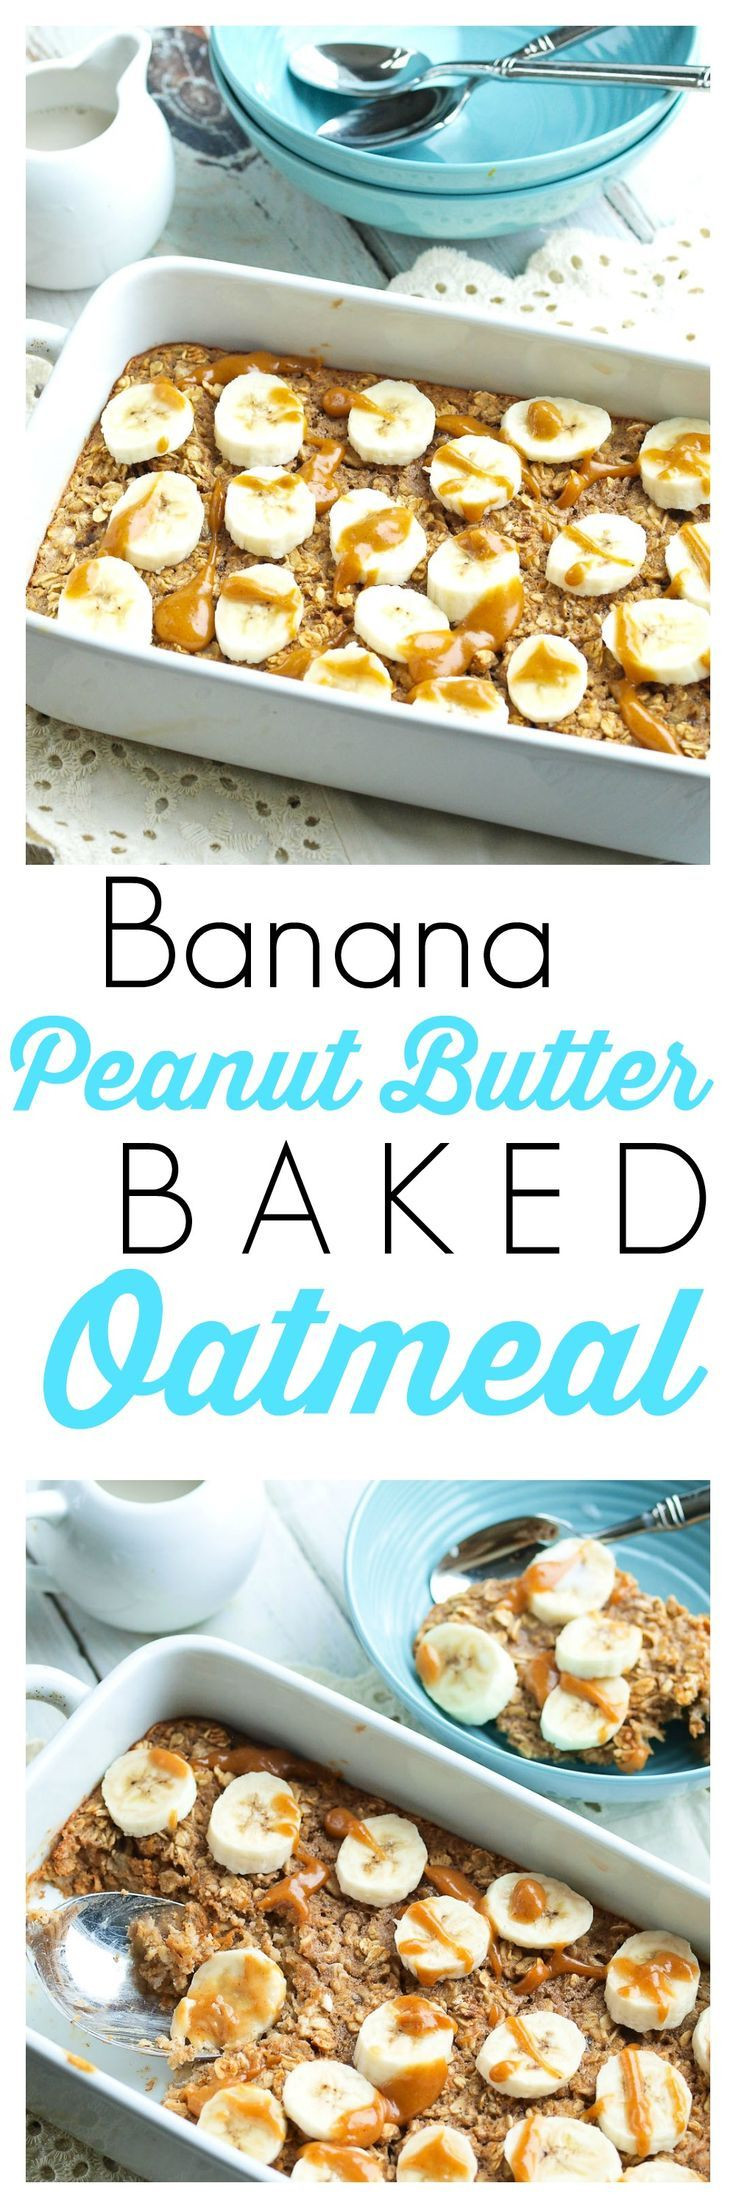 Healthy Breakfast Baking Recipes  Good & Healthy Breakfasts Banana Peanut Butter Baked